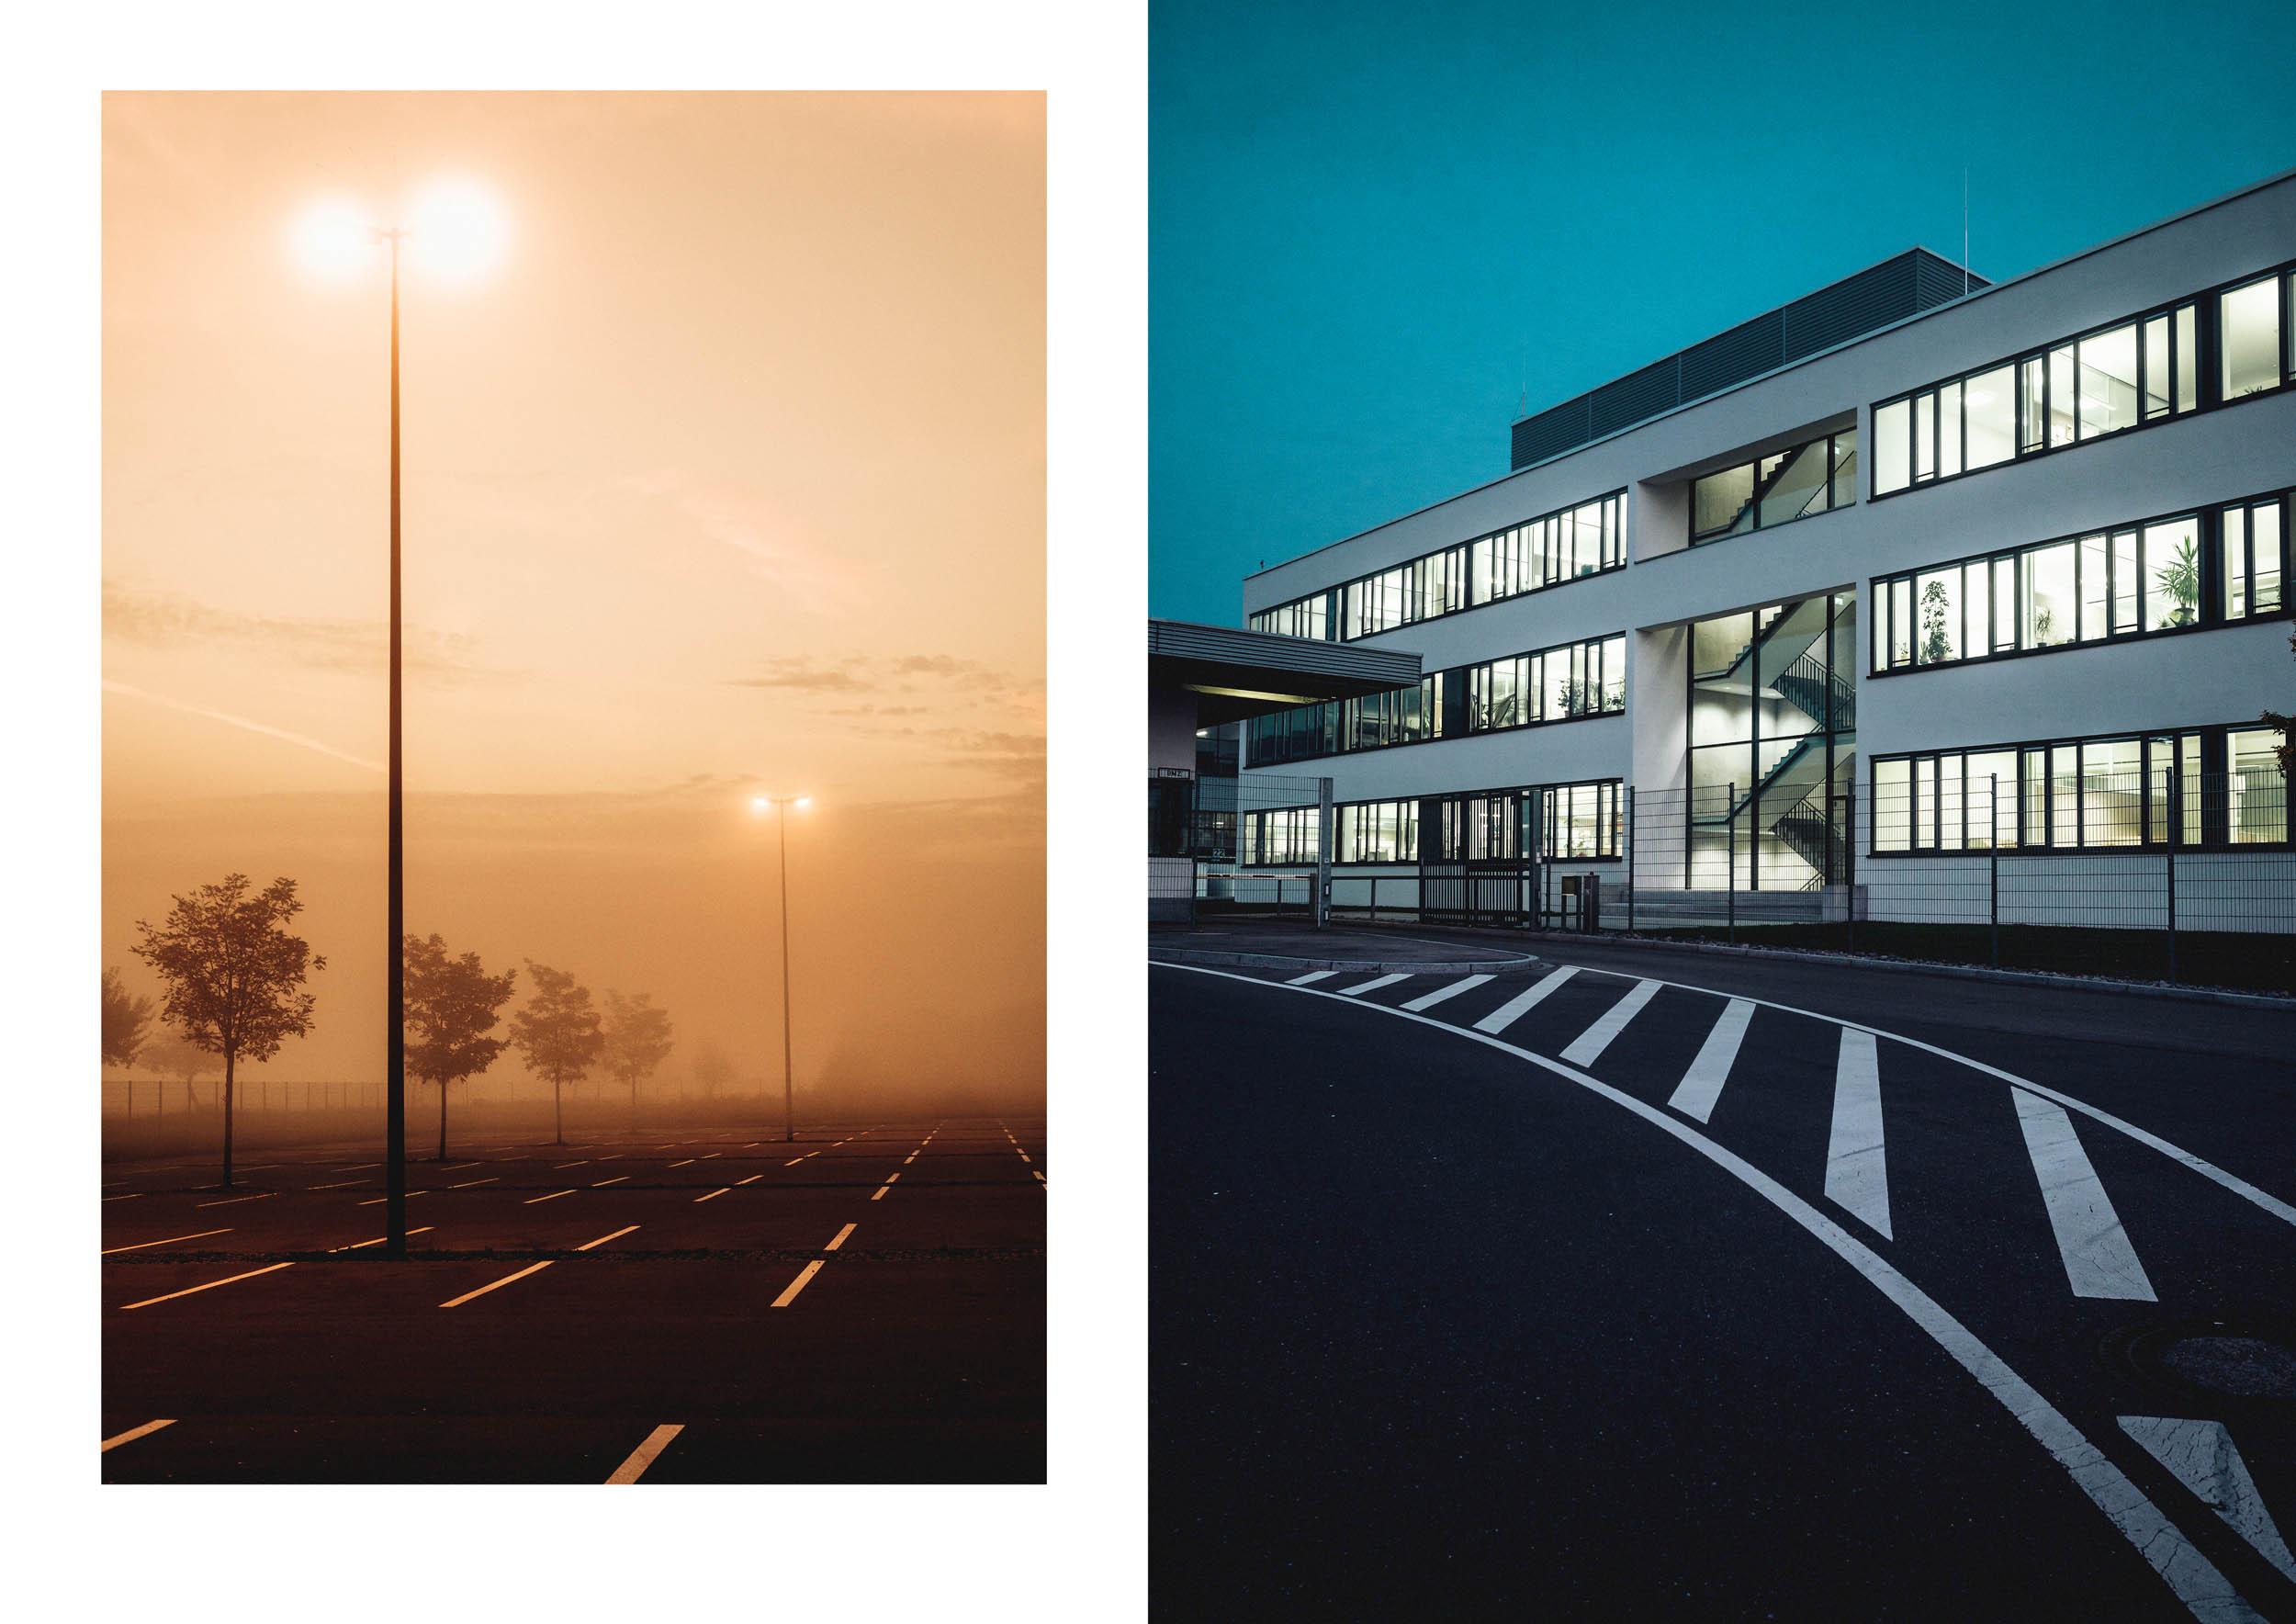 2018_SeifertUebler_schueller_kuechen_corporate_portrait_industrial_photography_002.jpg